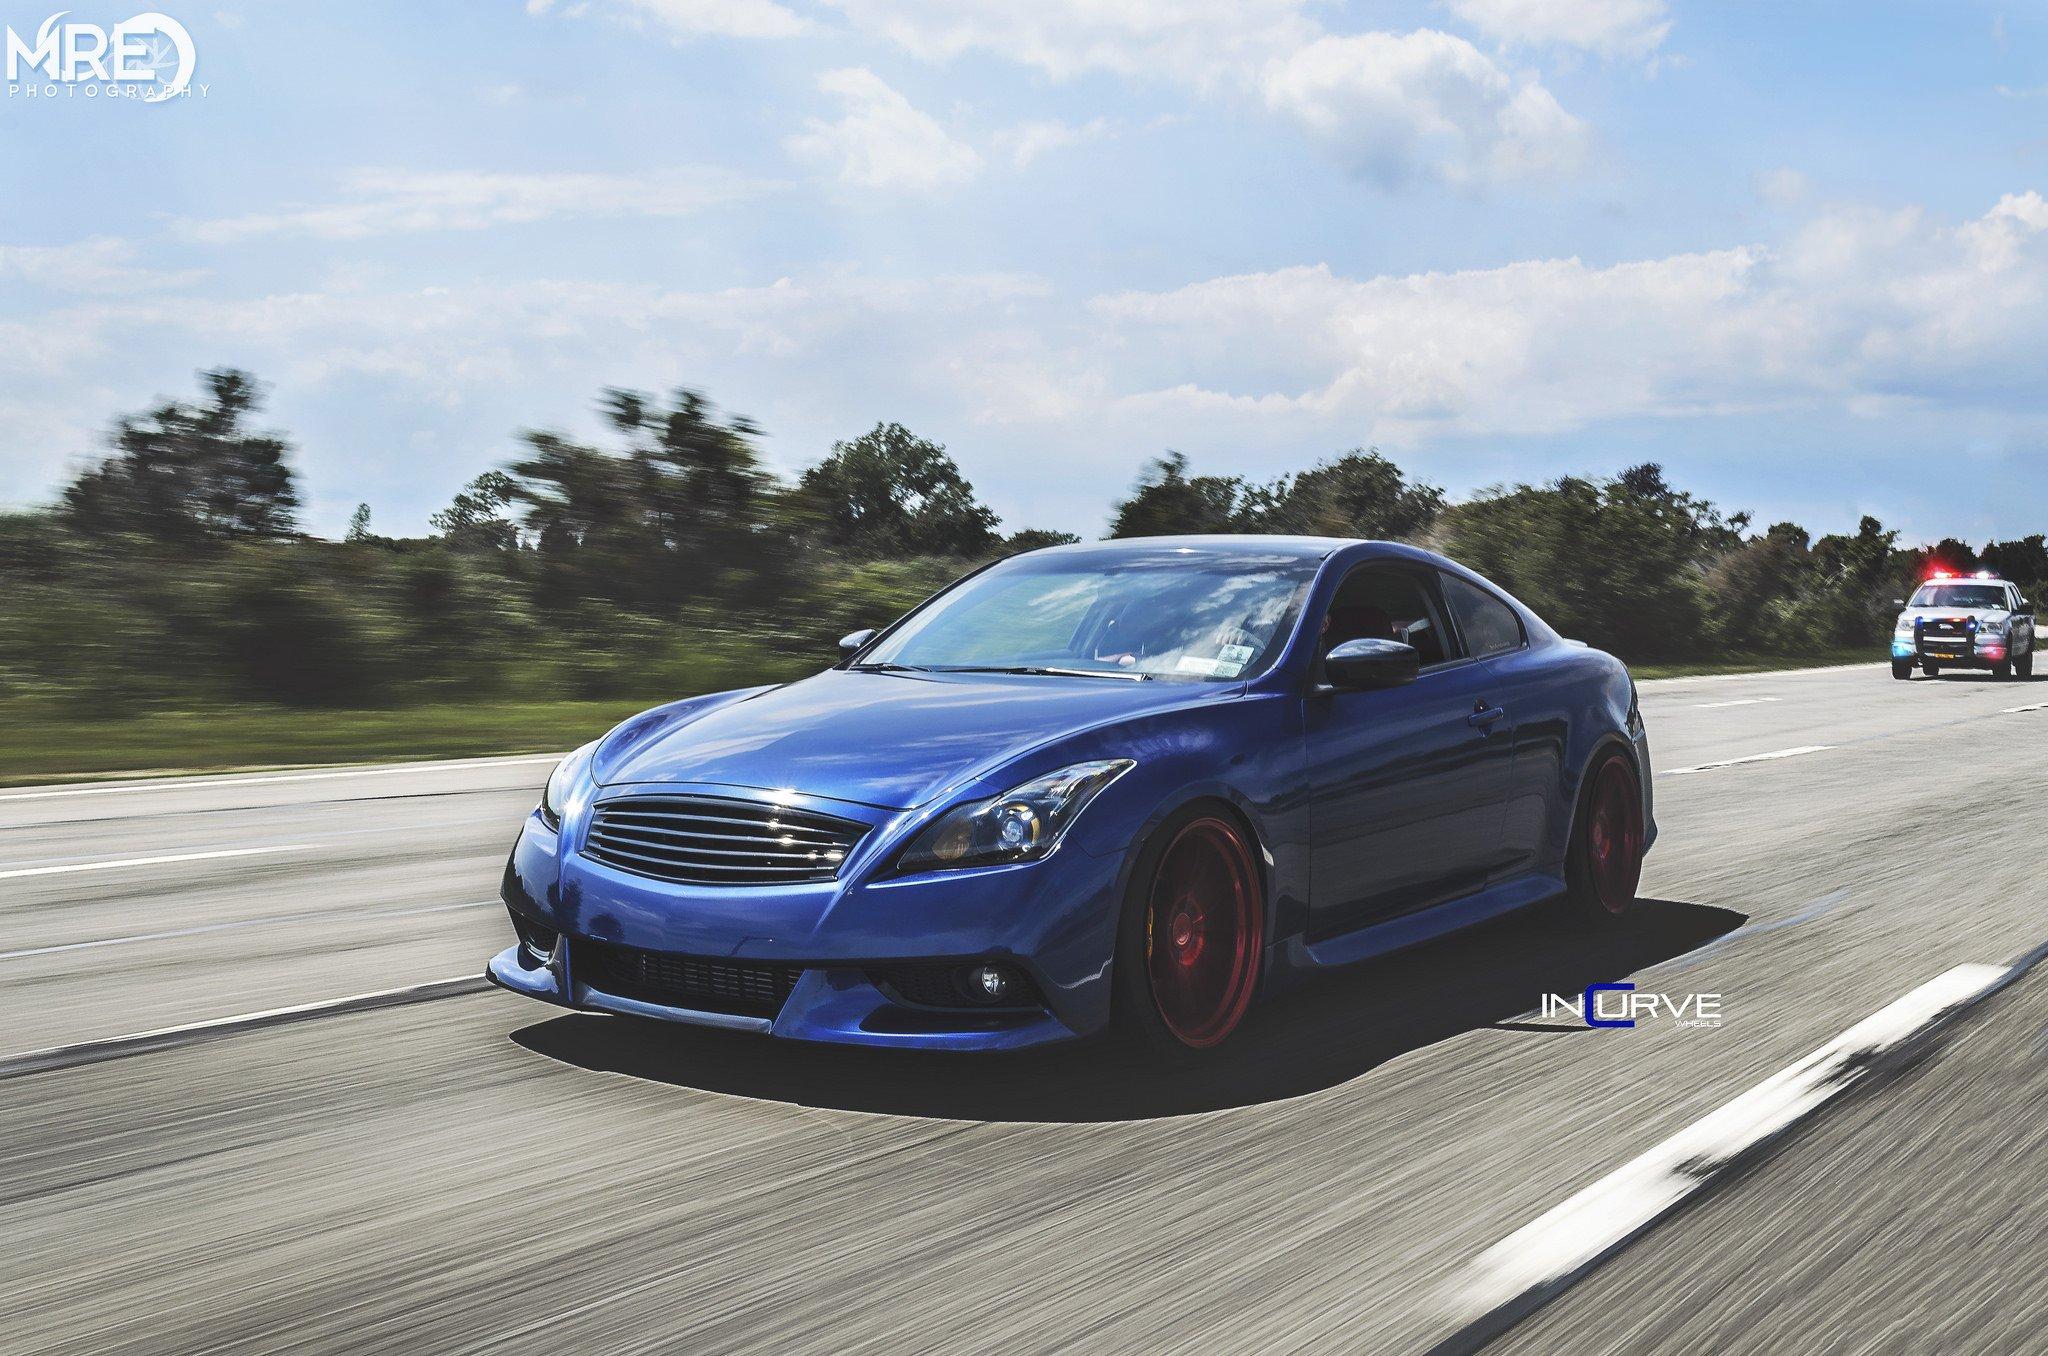 2015 Incurve Wheels Cars Tuning Infiniti G37 Ipl Wallpaper